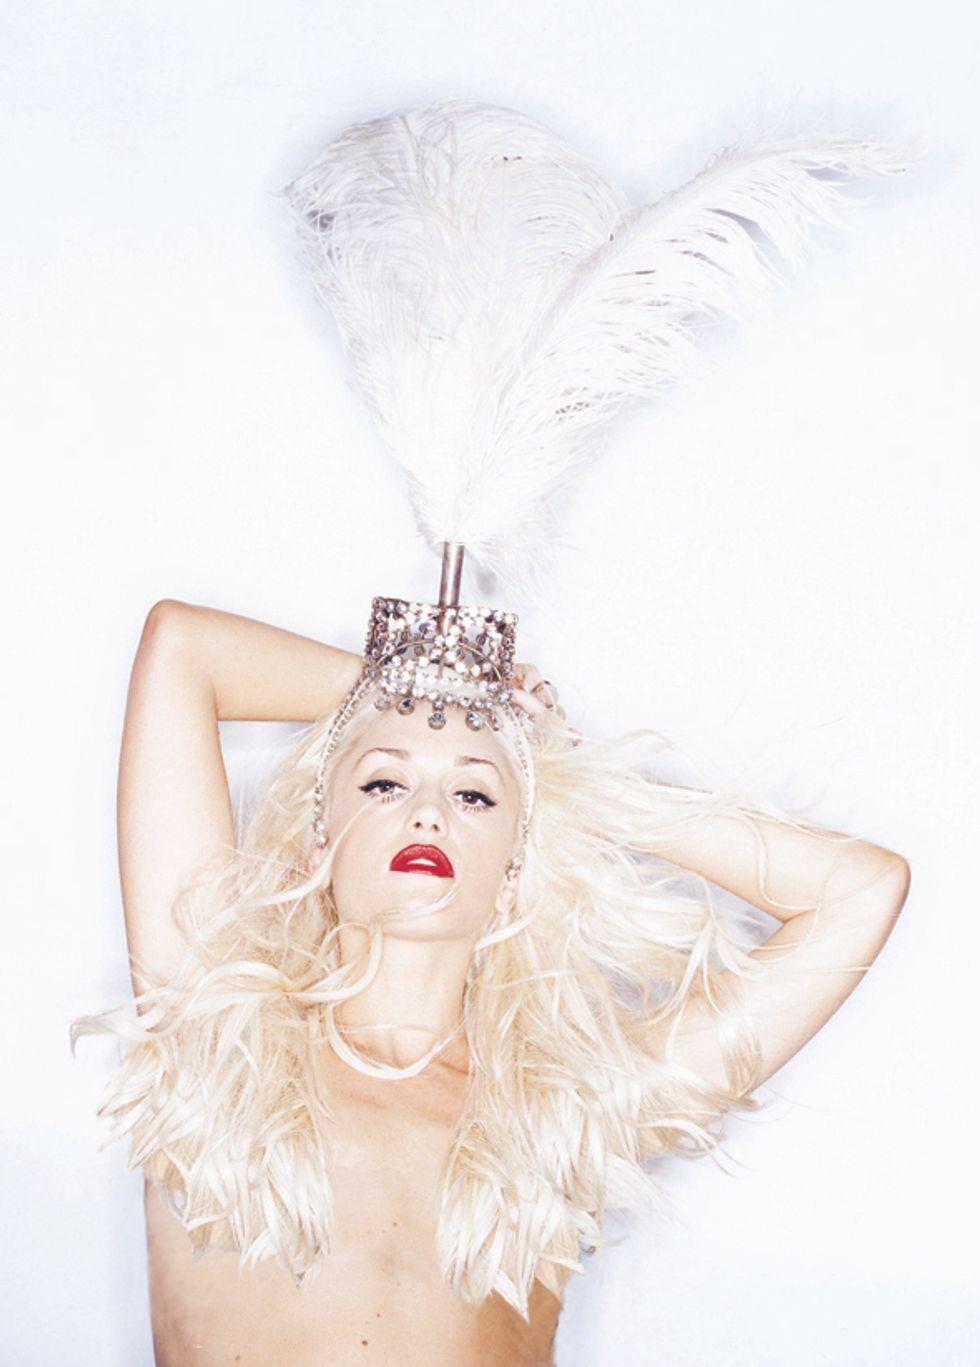 Gwen Stefani Puts Gavin Rossdale On Blast In Her New Song